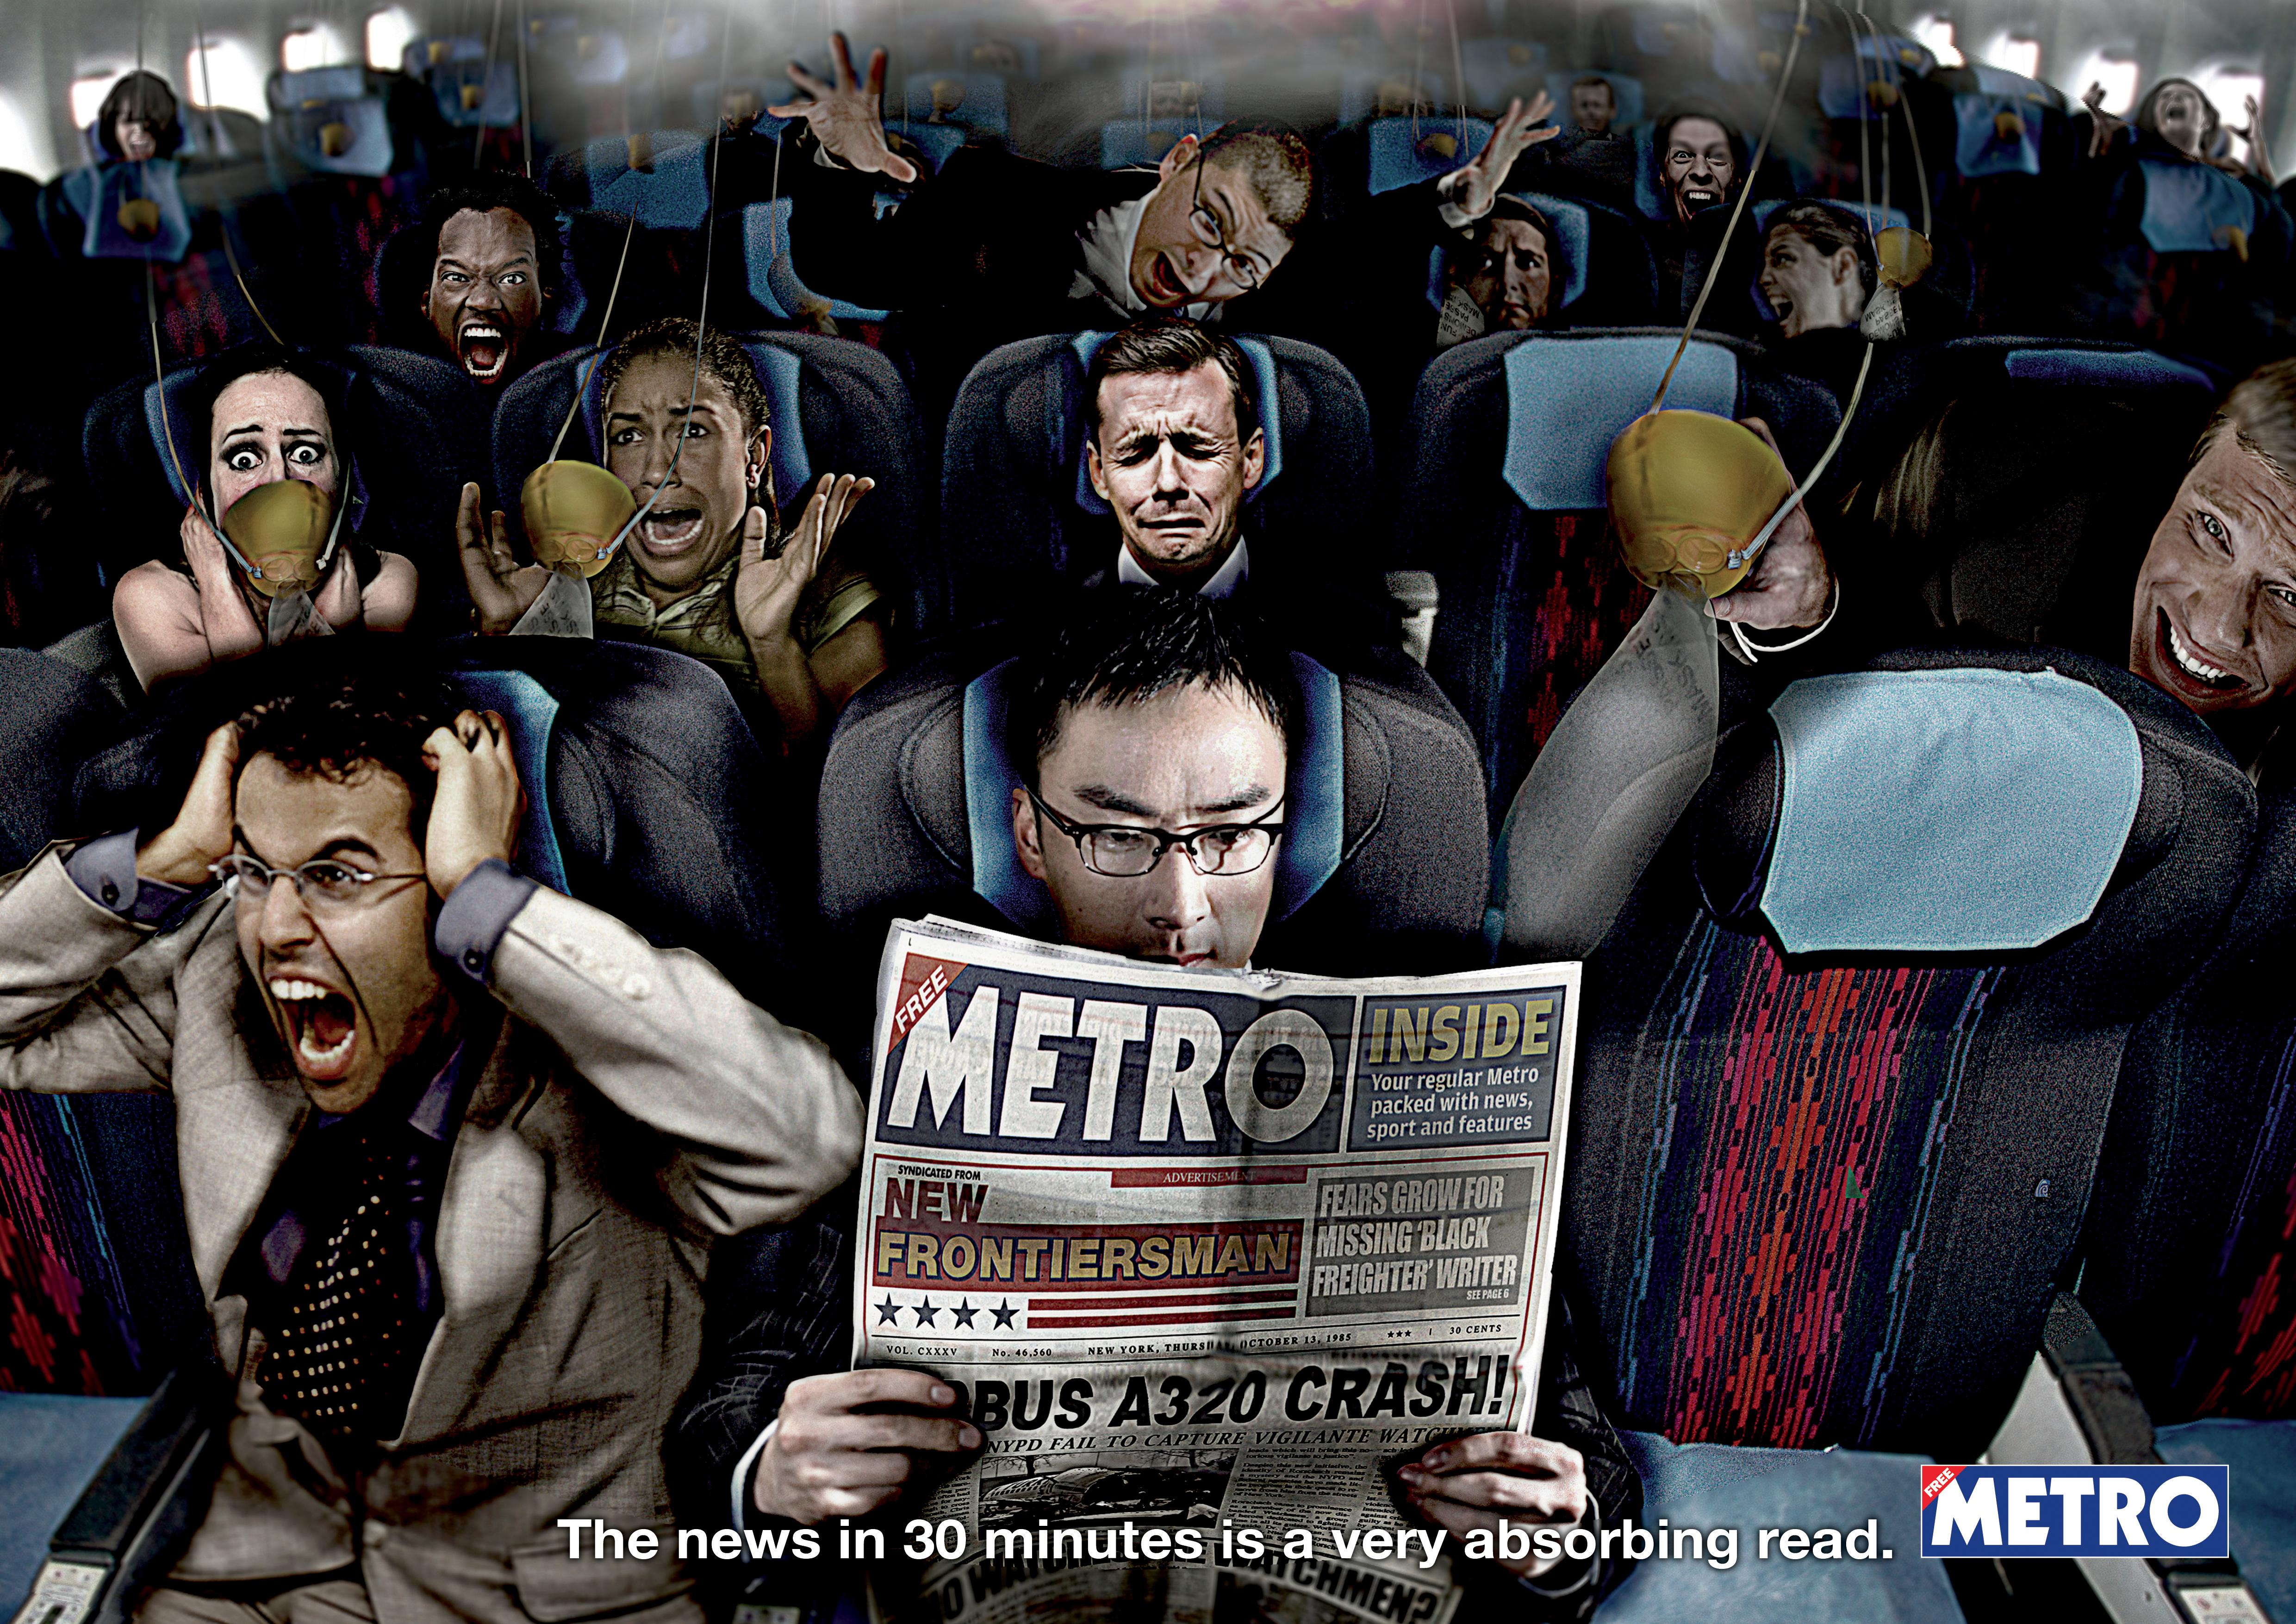 Metro_airplane